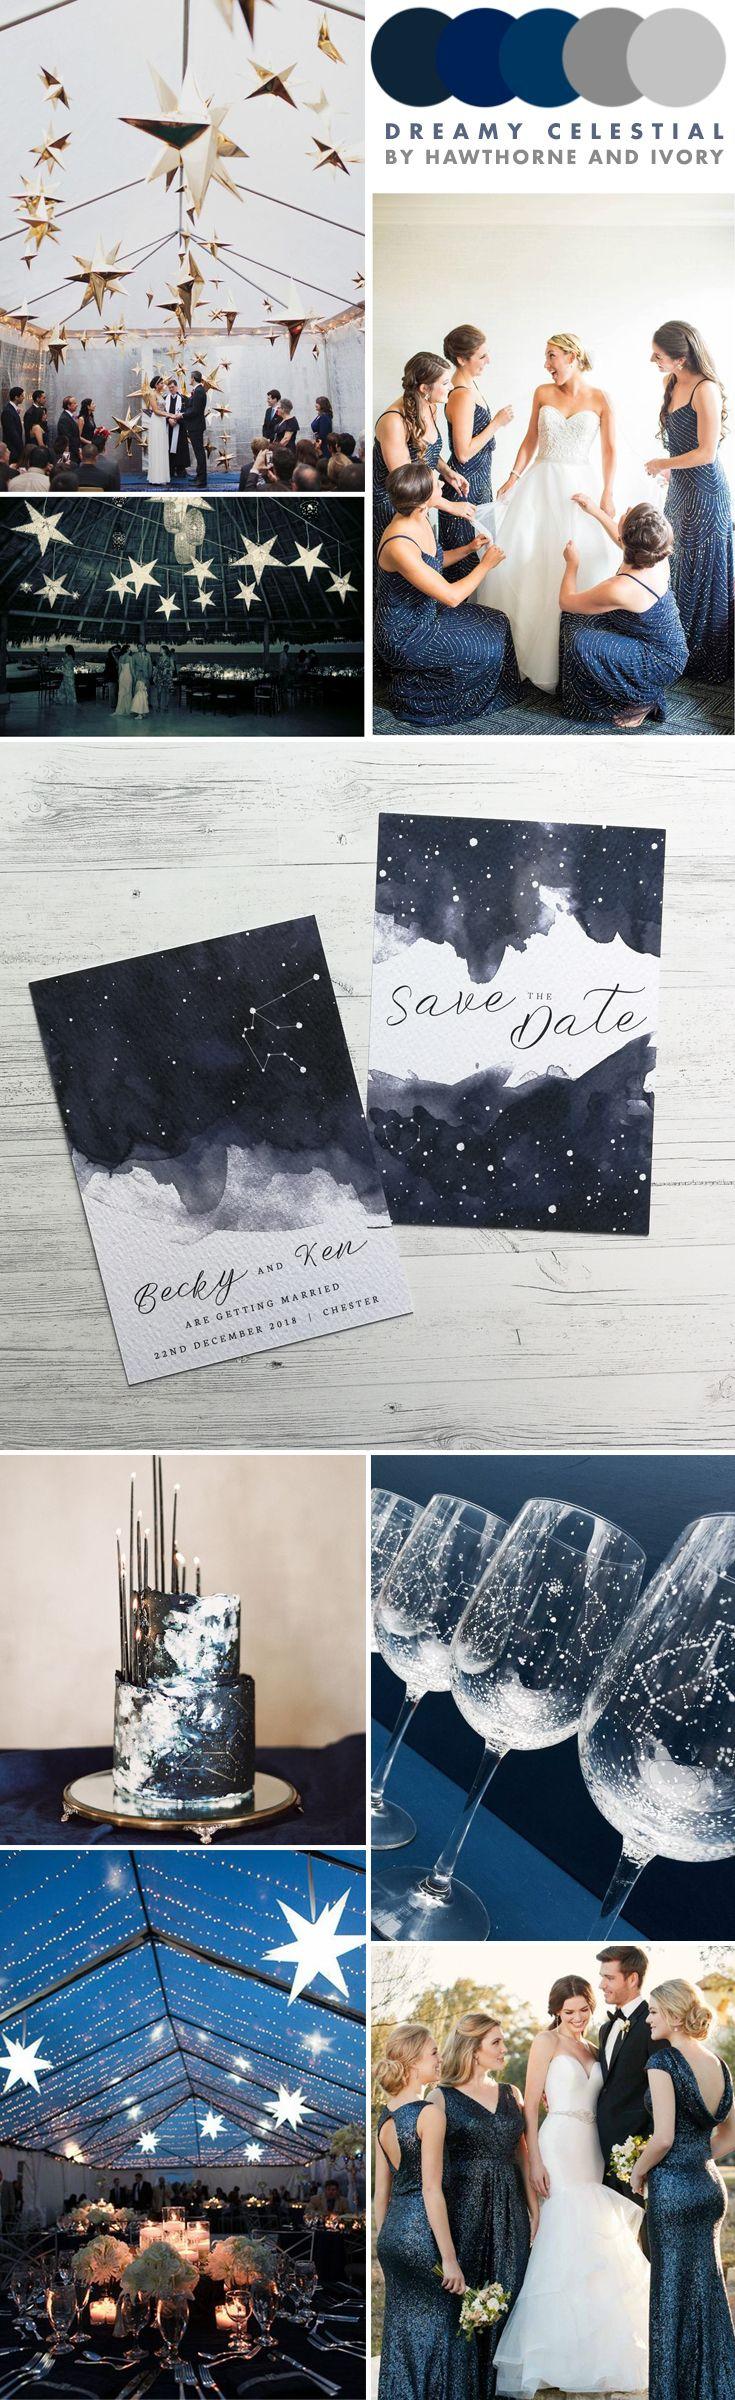 Celestial Star Themed Wedding Inspiration Moodboard